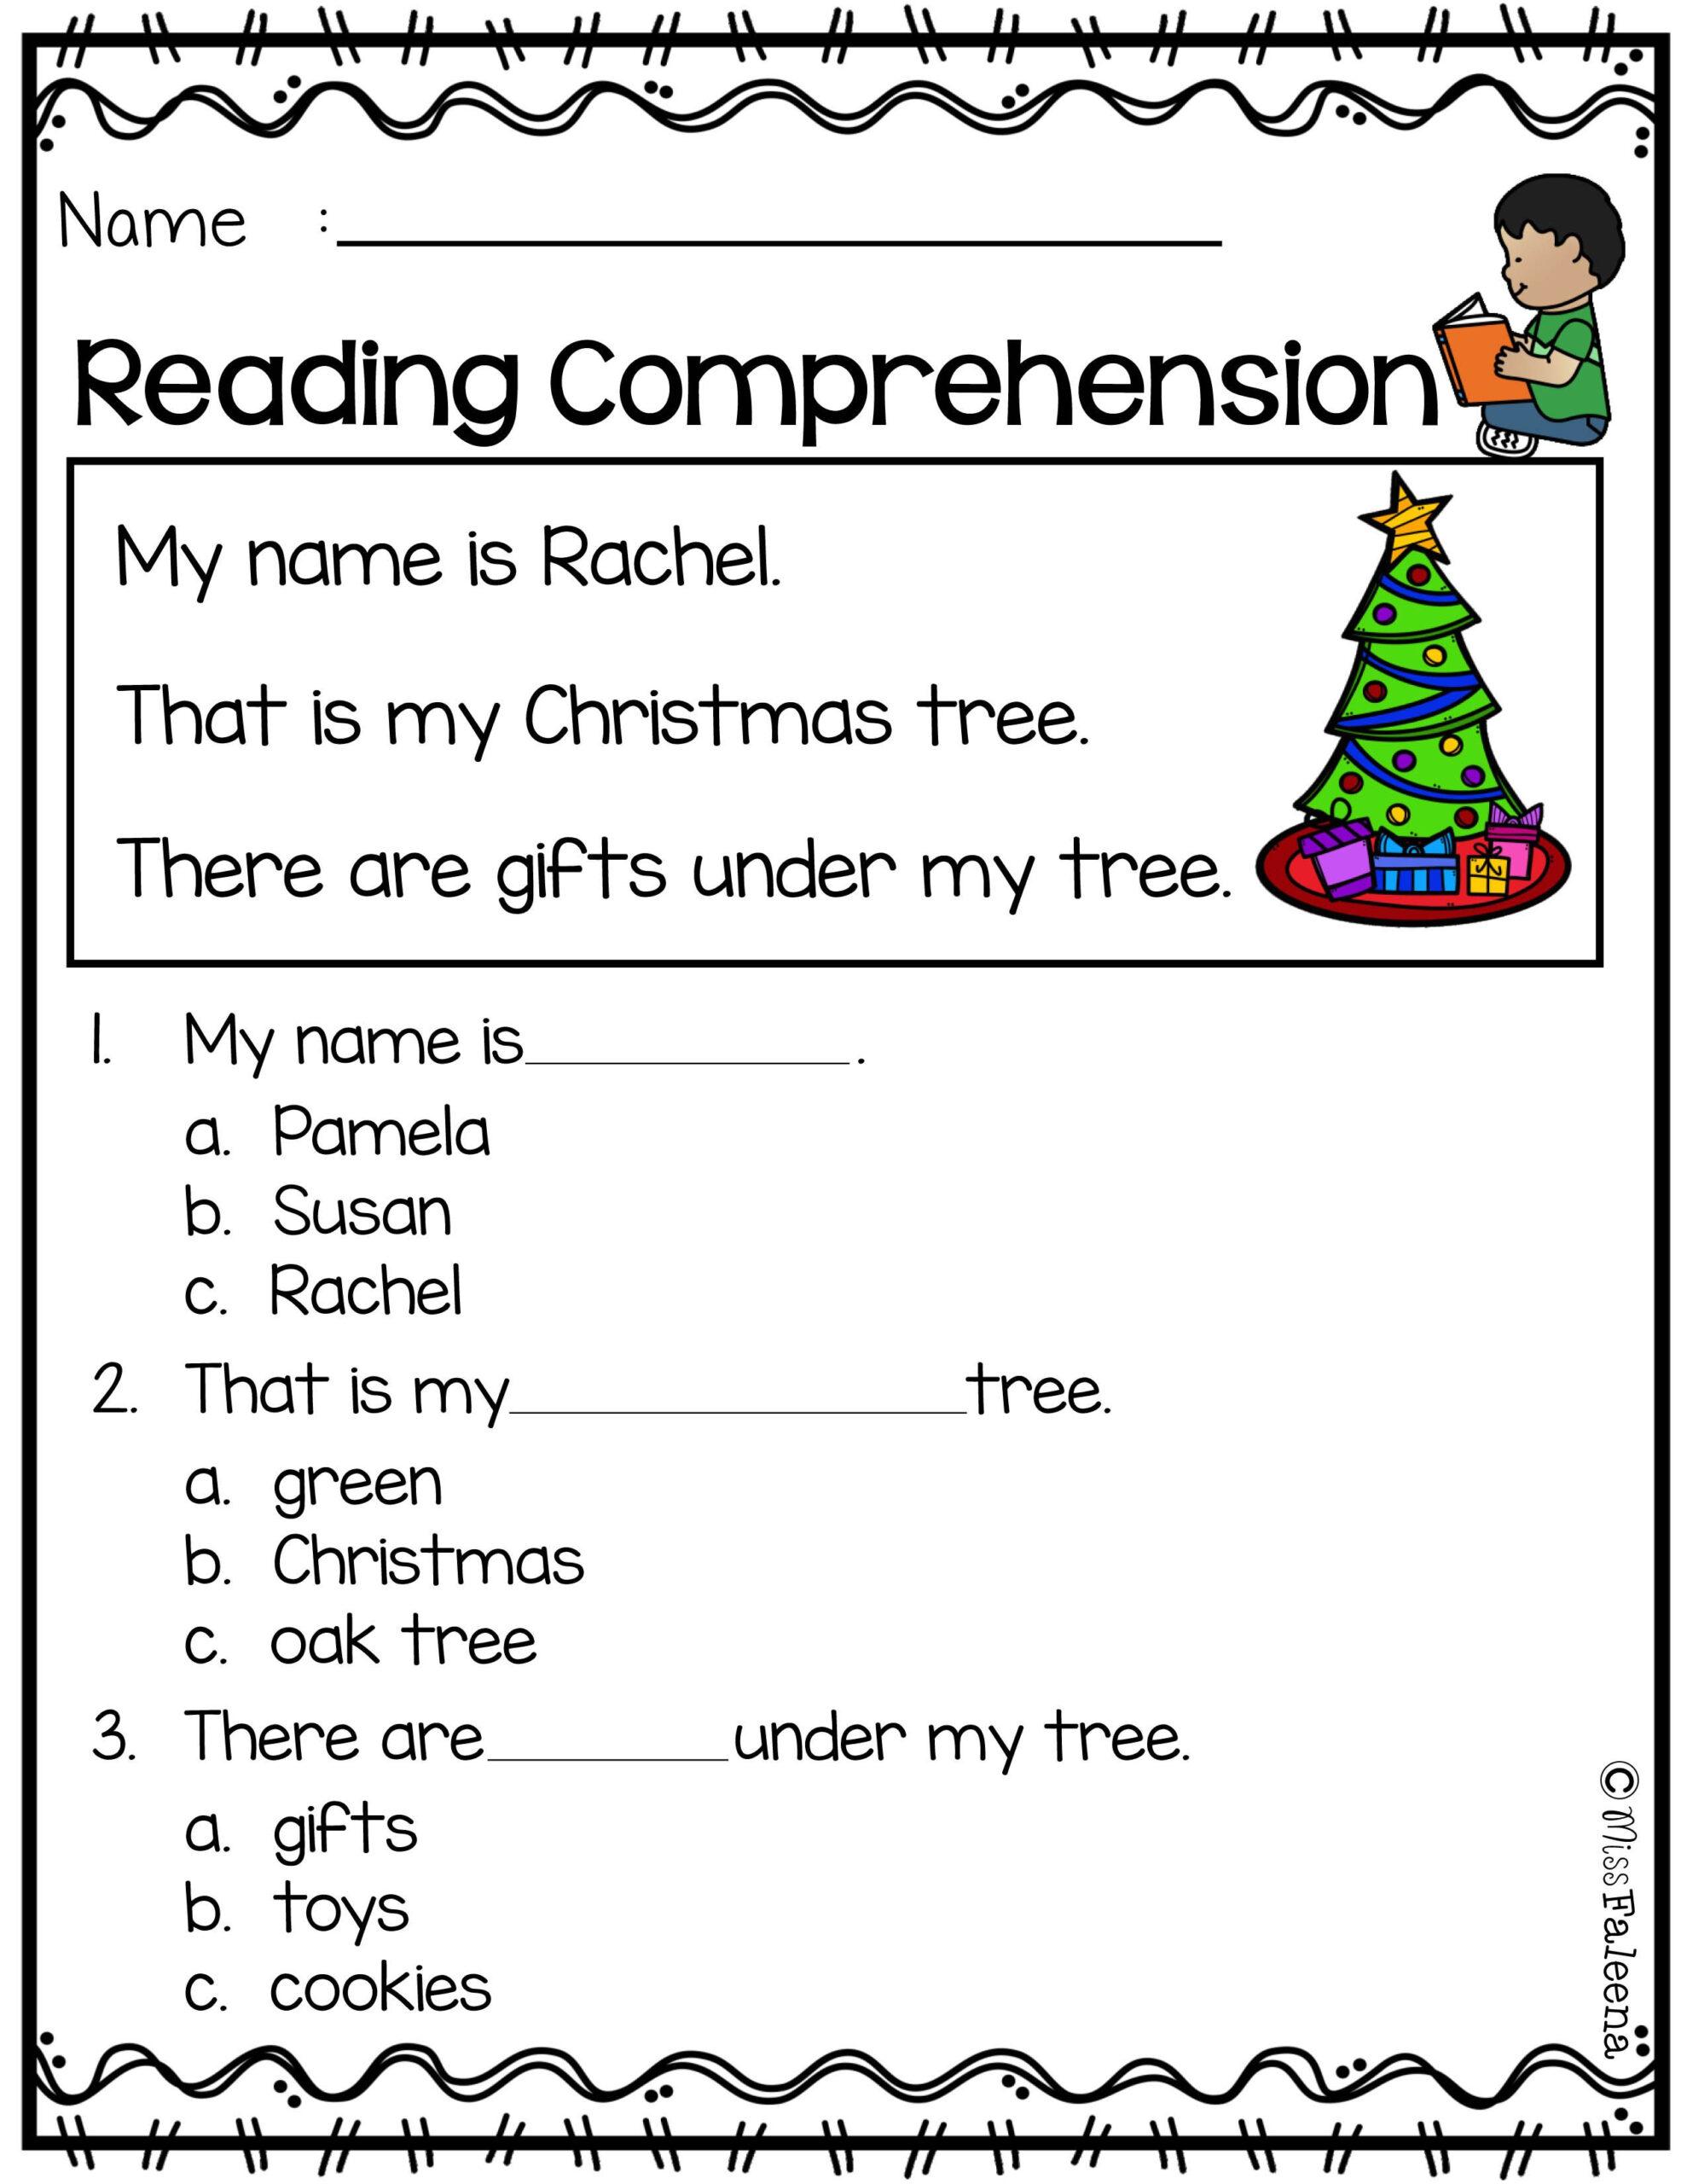 Free Reading Comprehension | Reading Comprehension